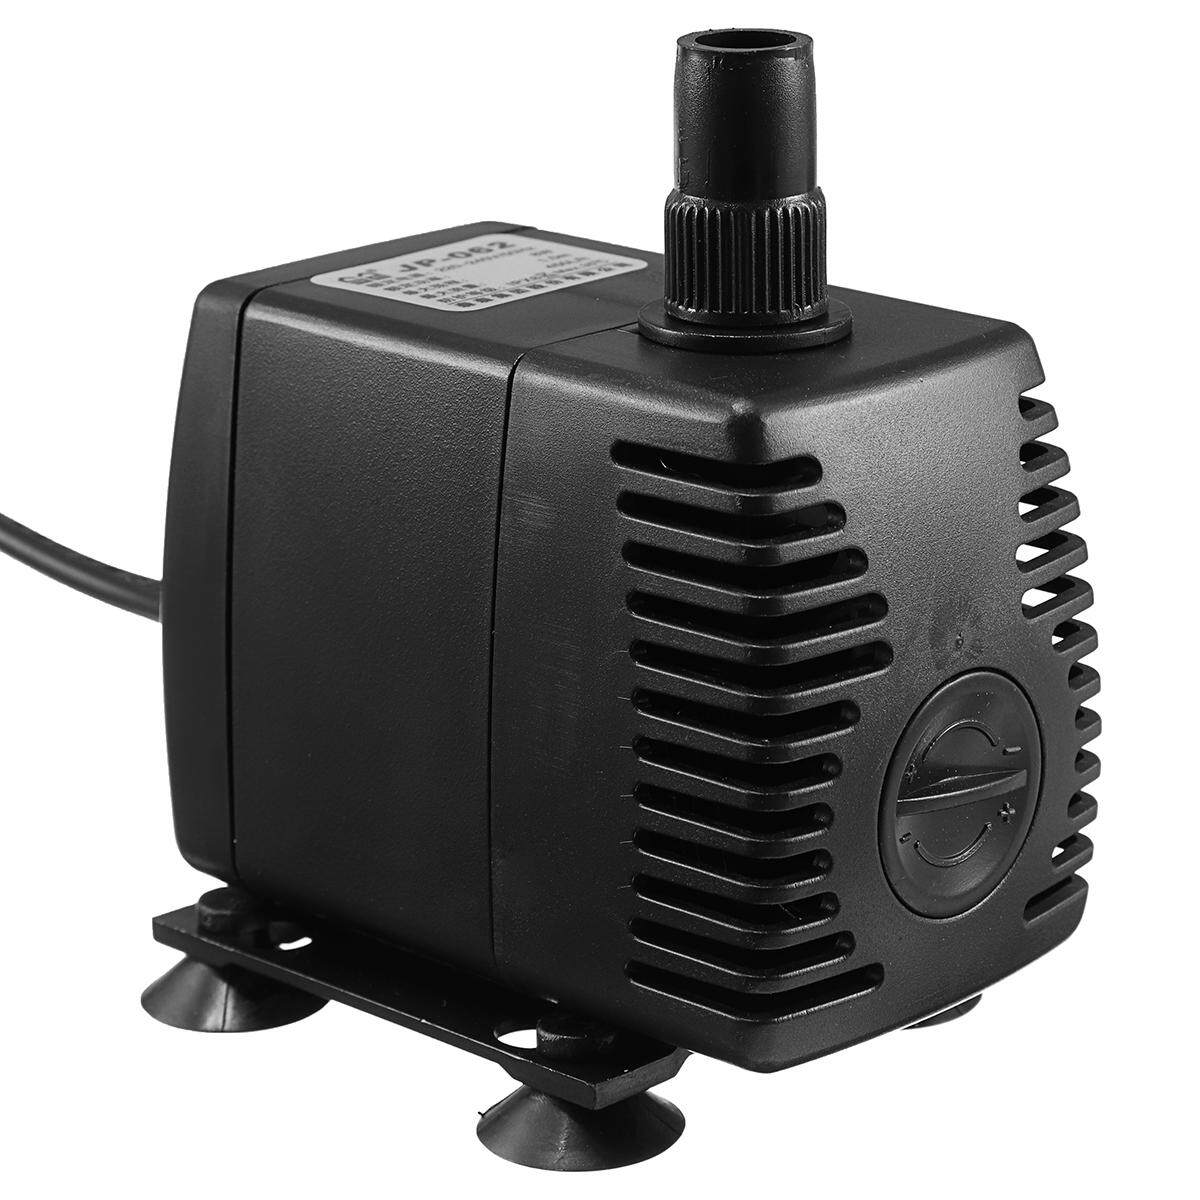 8 W 450L/H Pompa Celup Akuarium Tangki Ikan Powerhead Filter & Sucker-Intl - 4